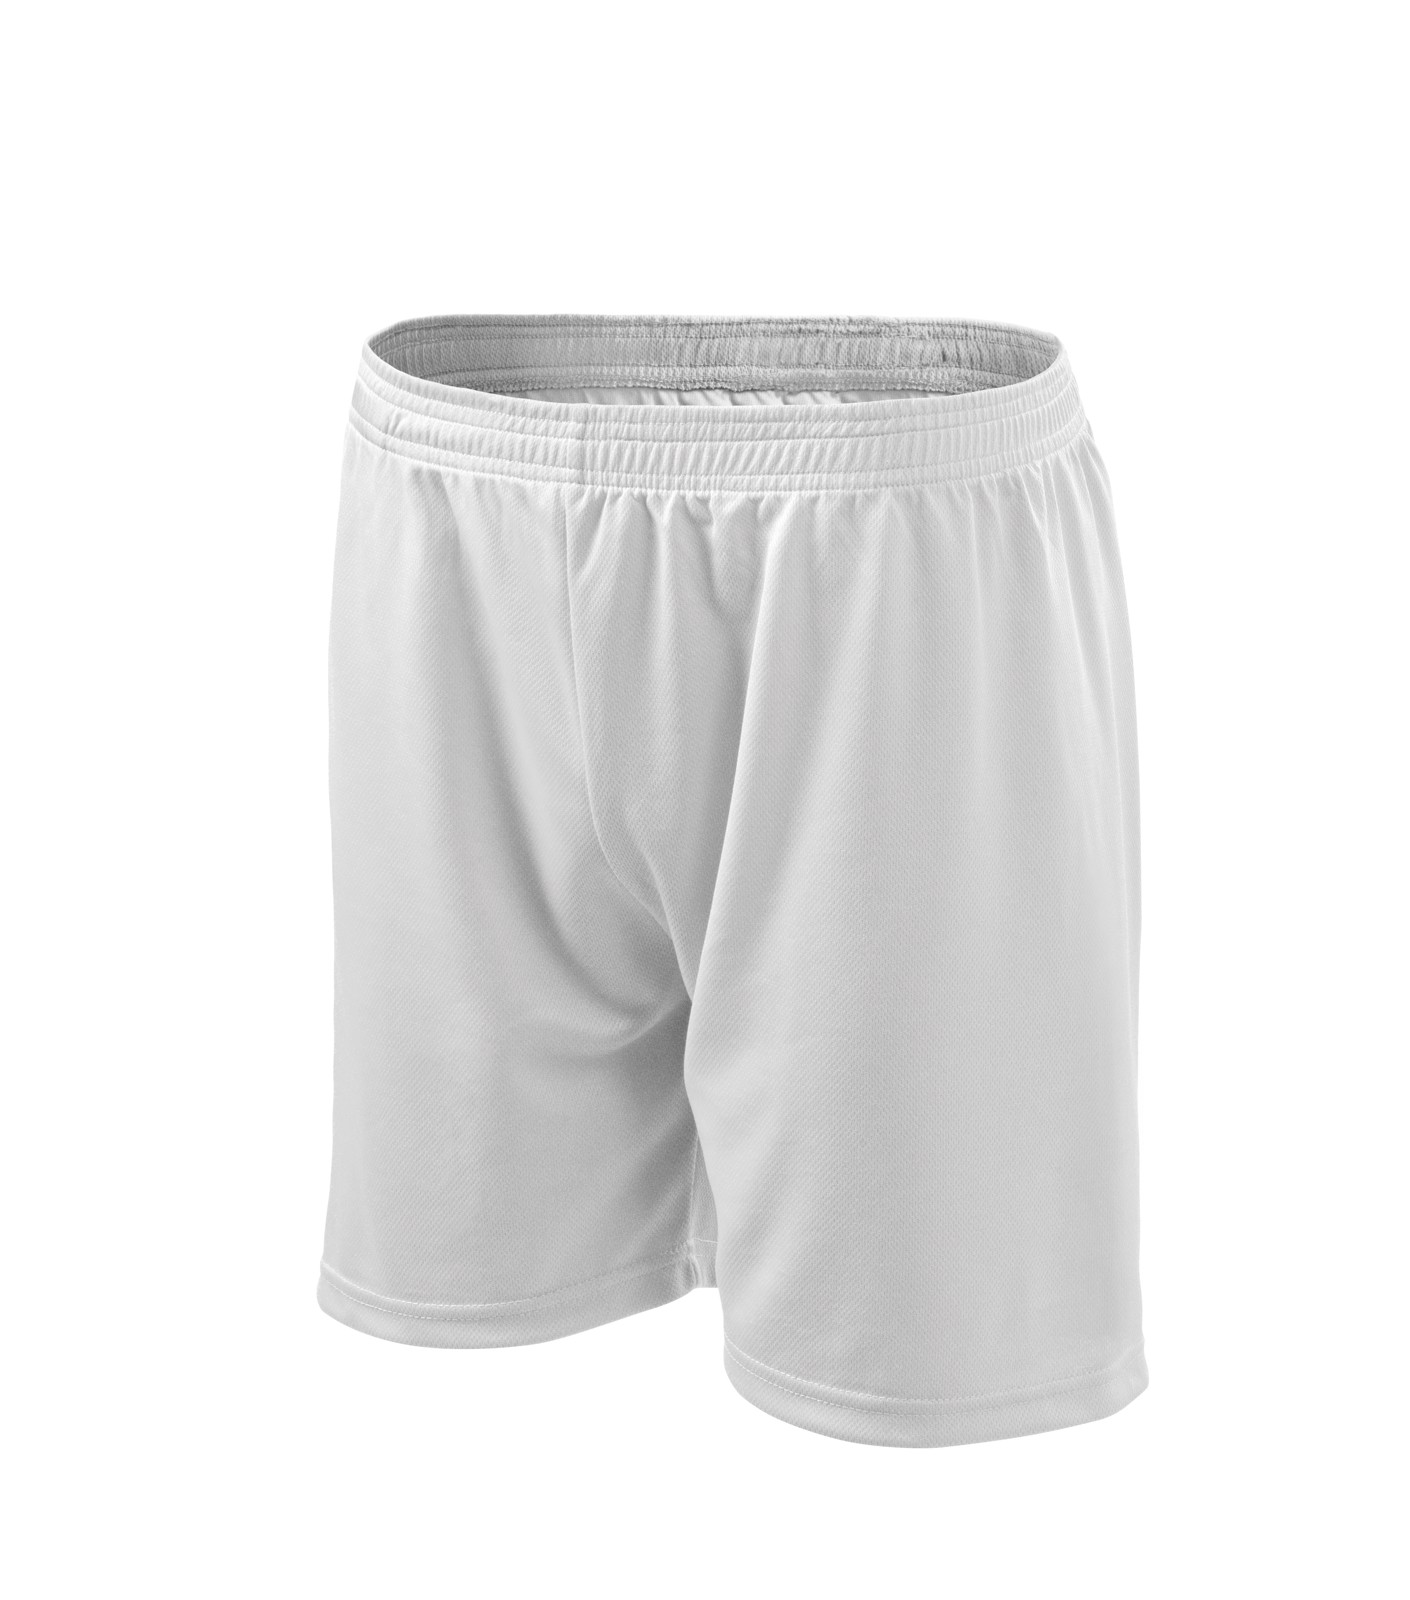 Shorts men's/kids Malfini Playtime - White / L